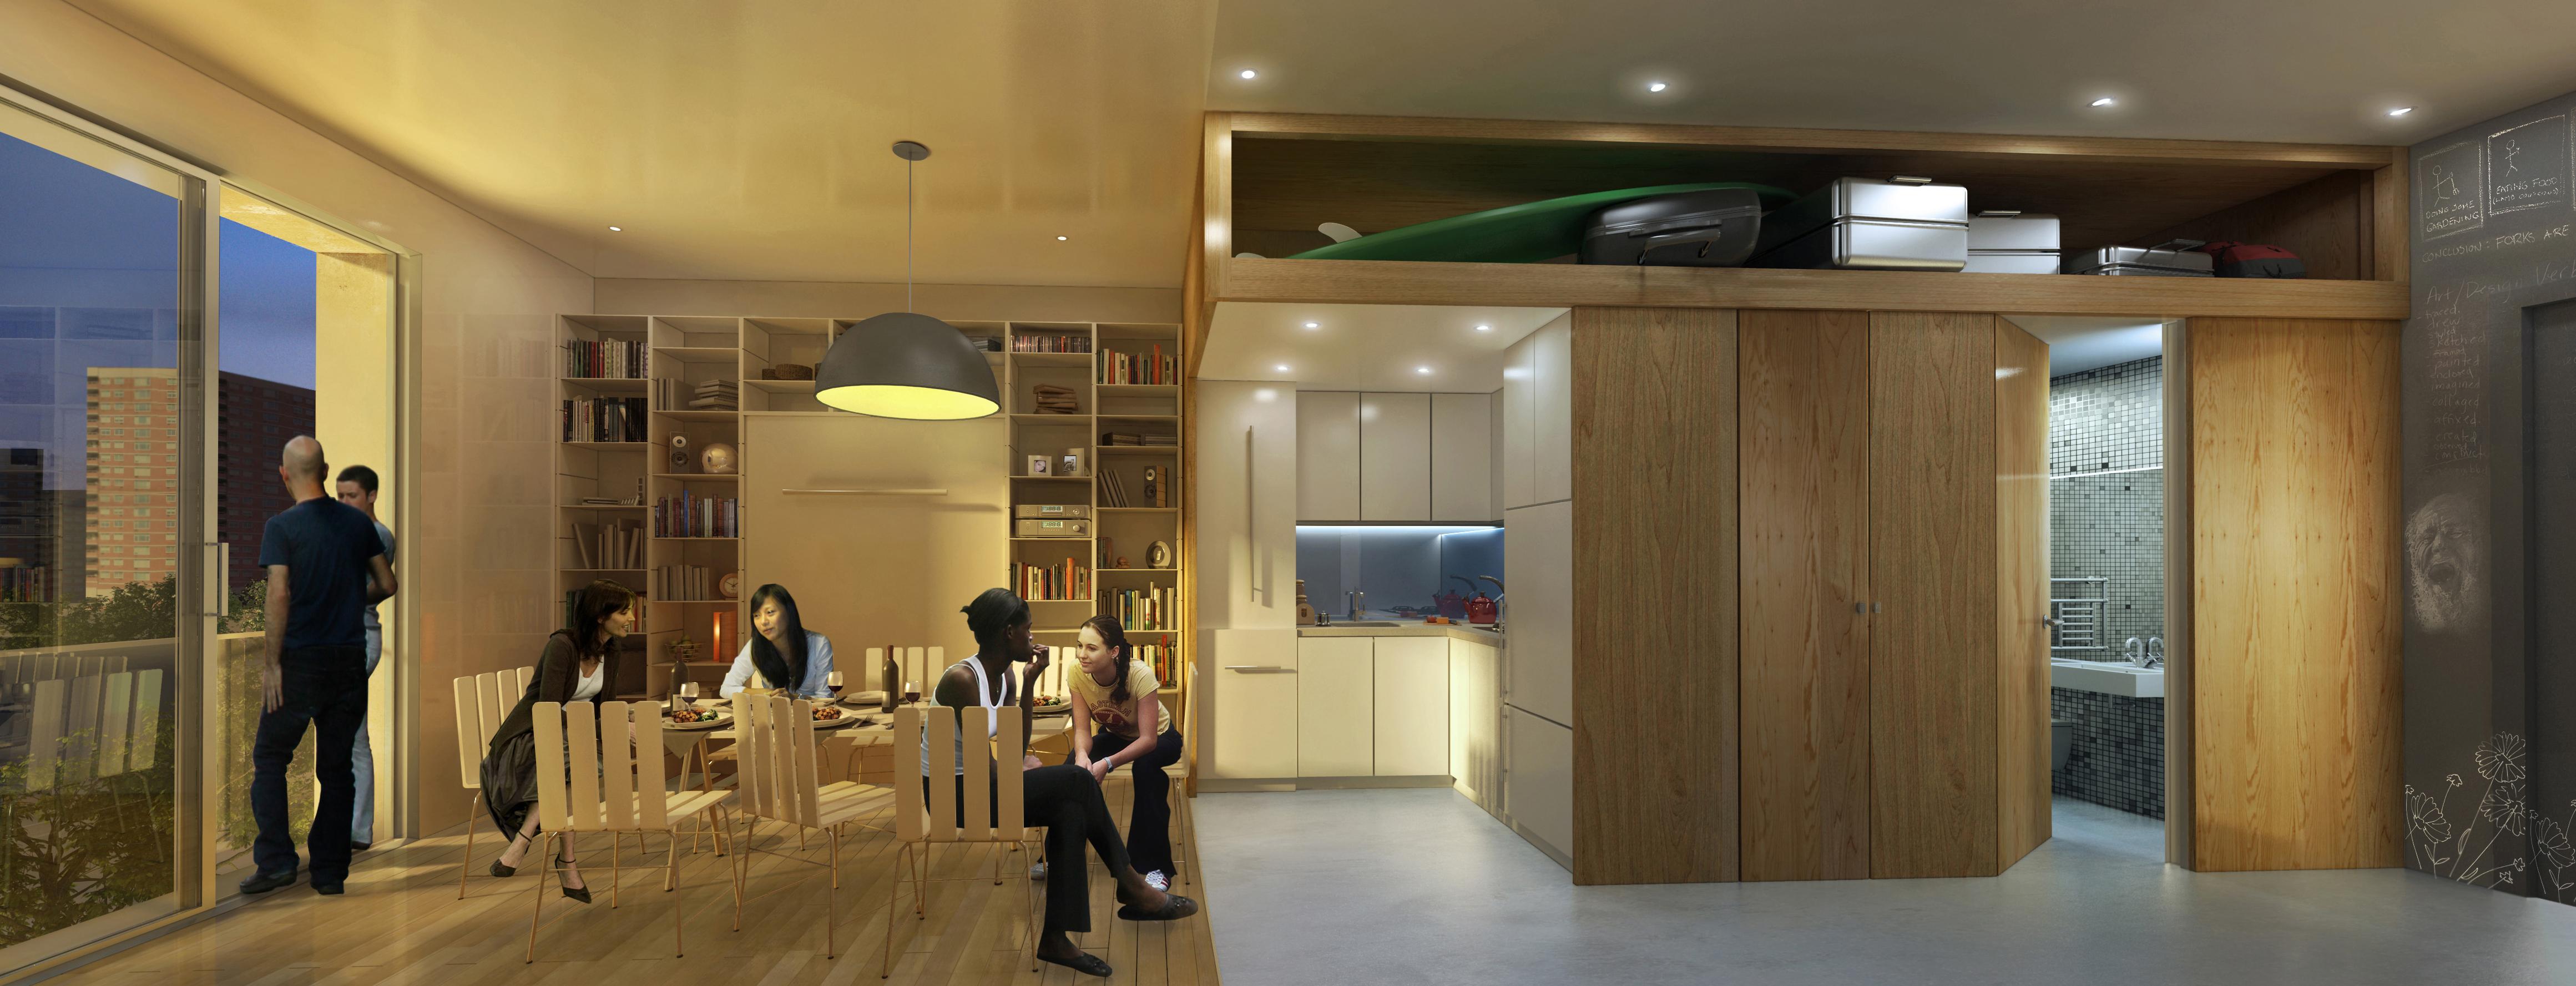 apartments under 400. New York City unveils its vision for micro apartments under 400 sq  ft Quartz